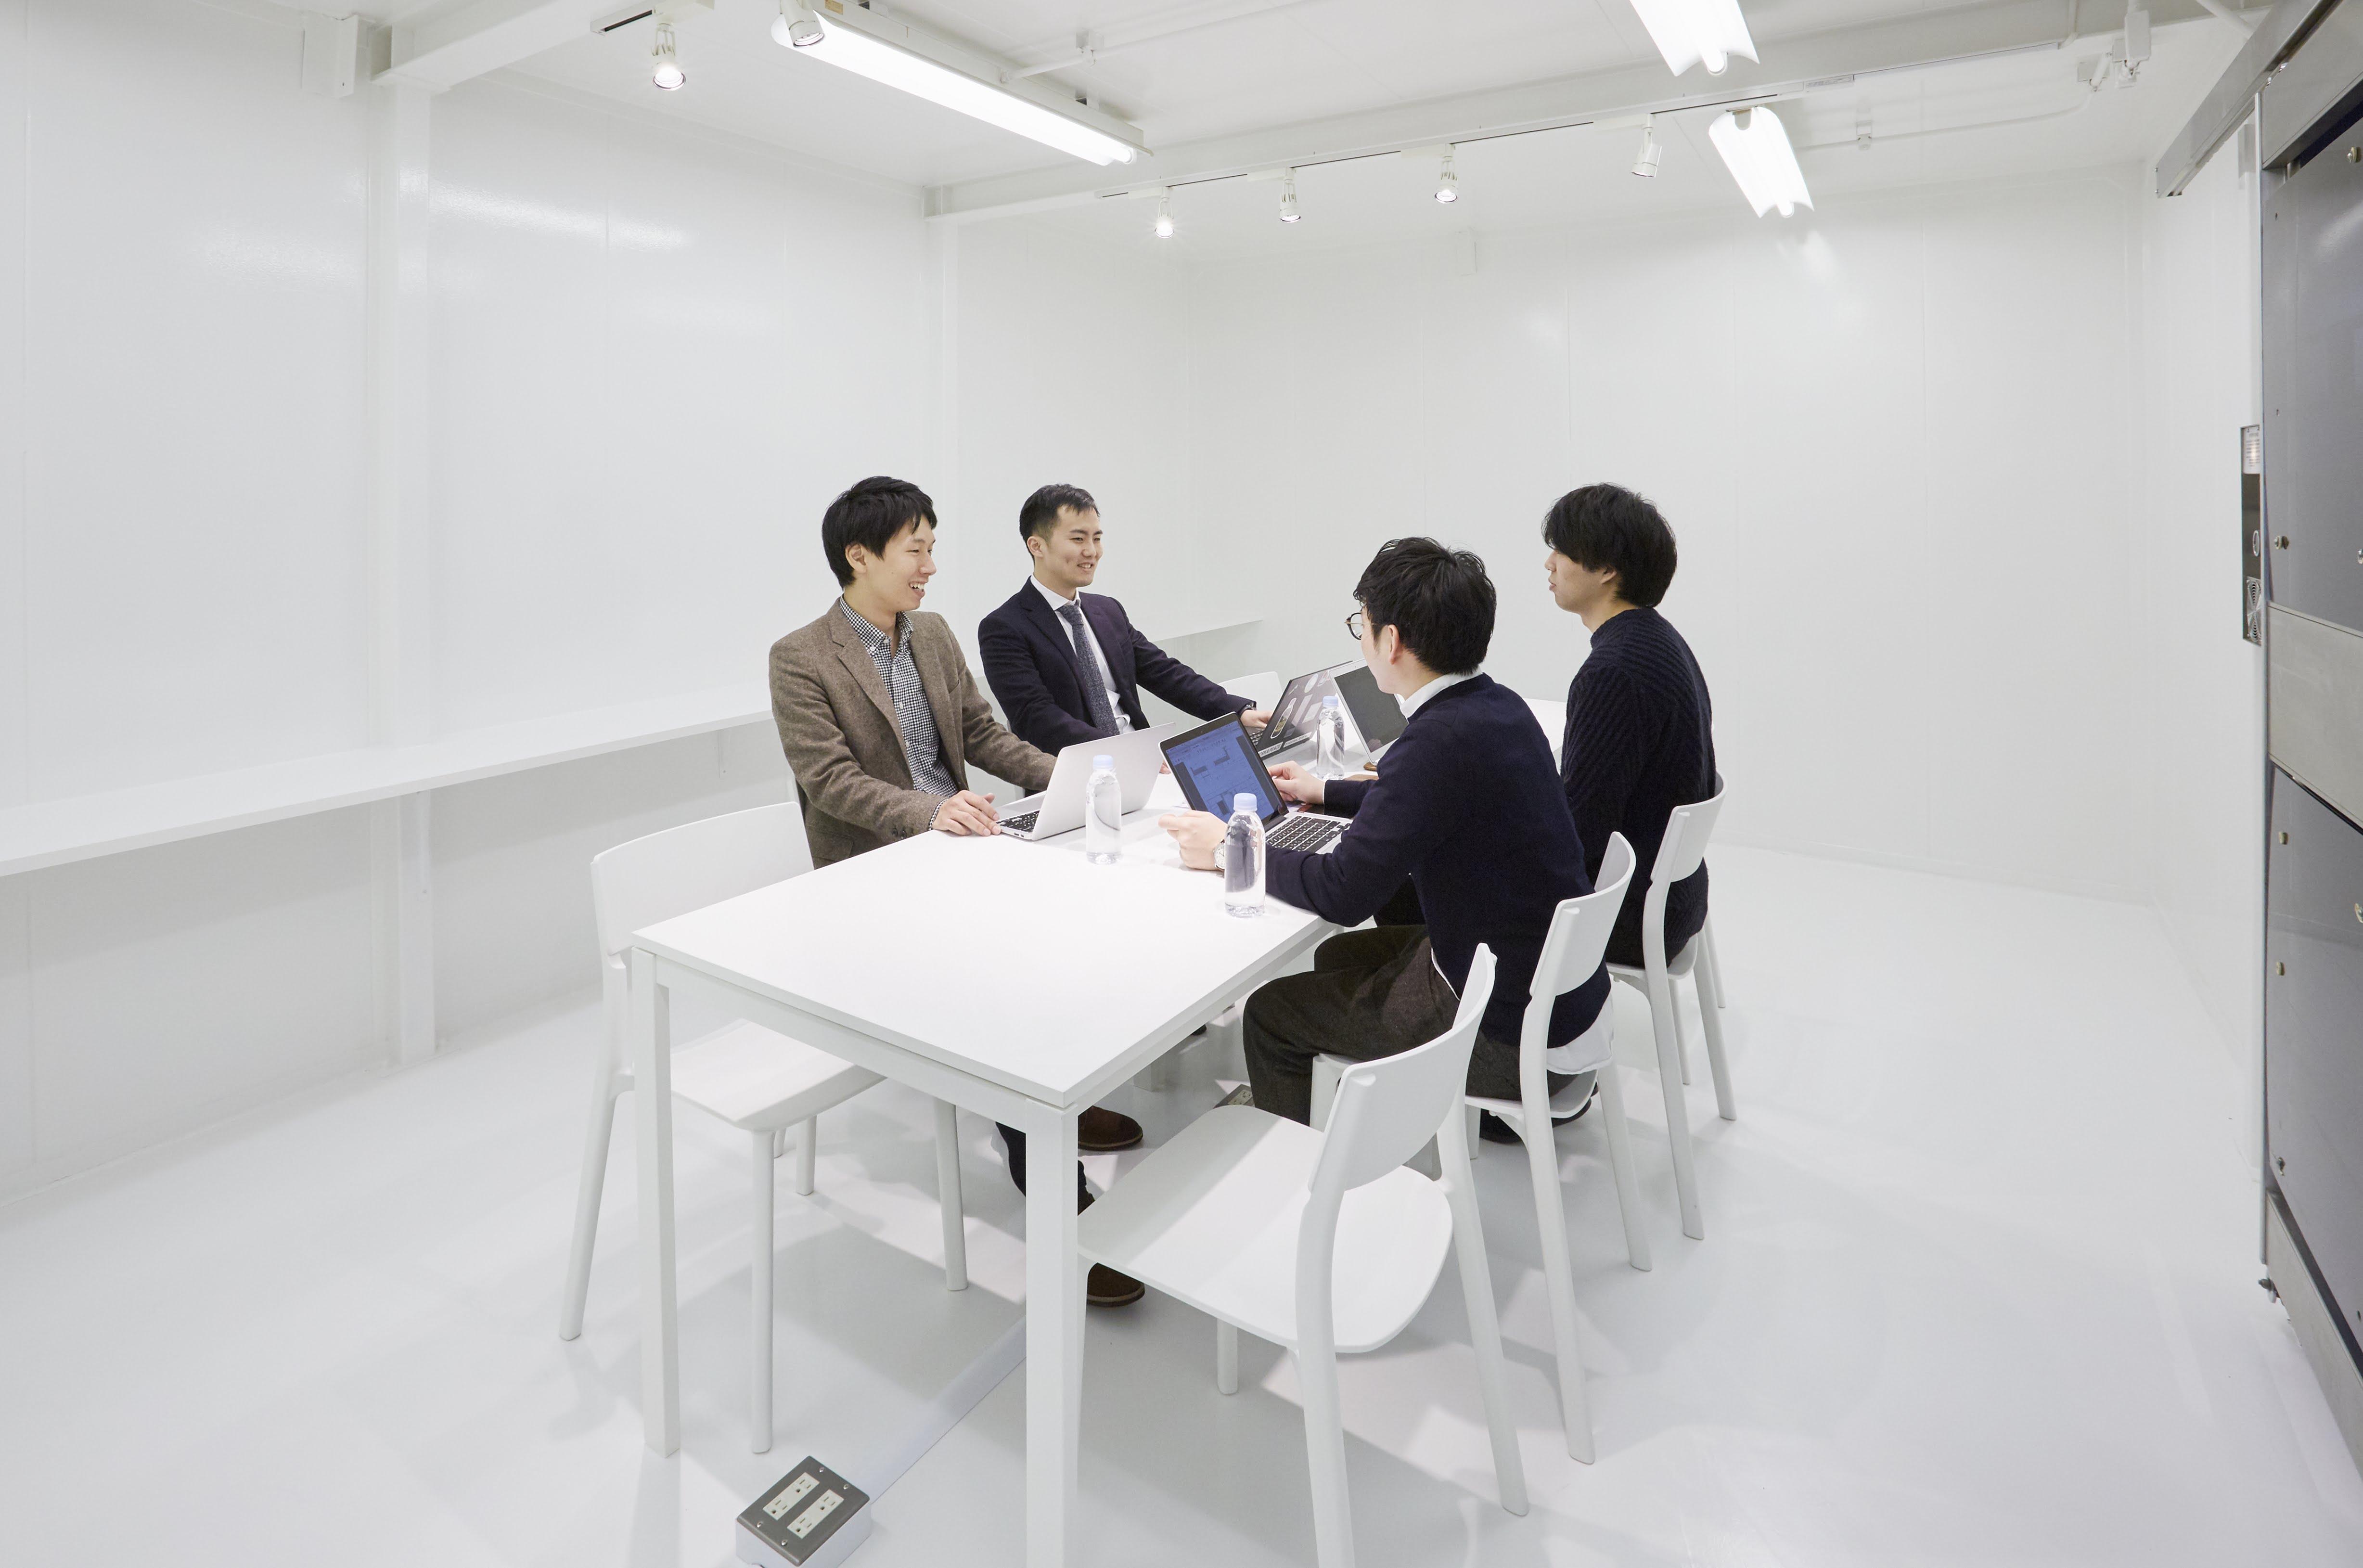 DIAGONAL RUN FUKUOKA - ダイアゴナルラン福岡